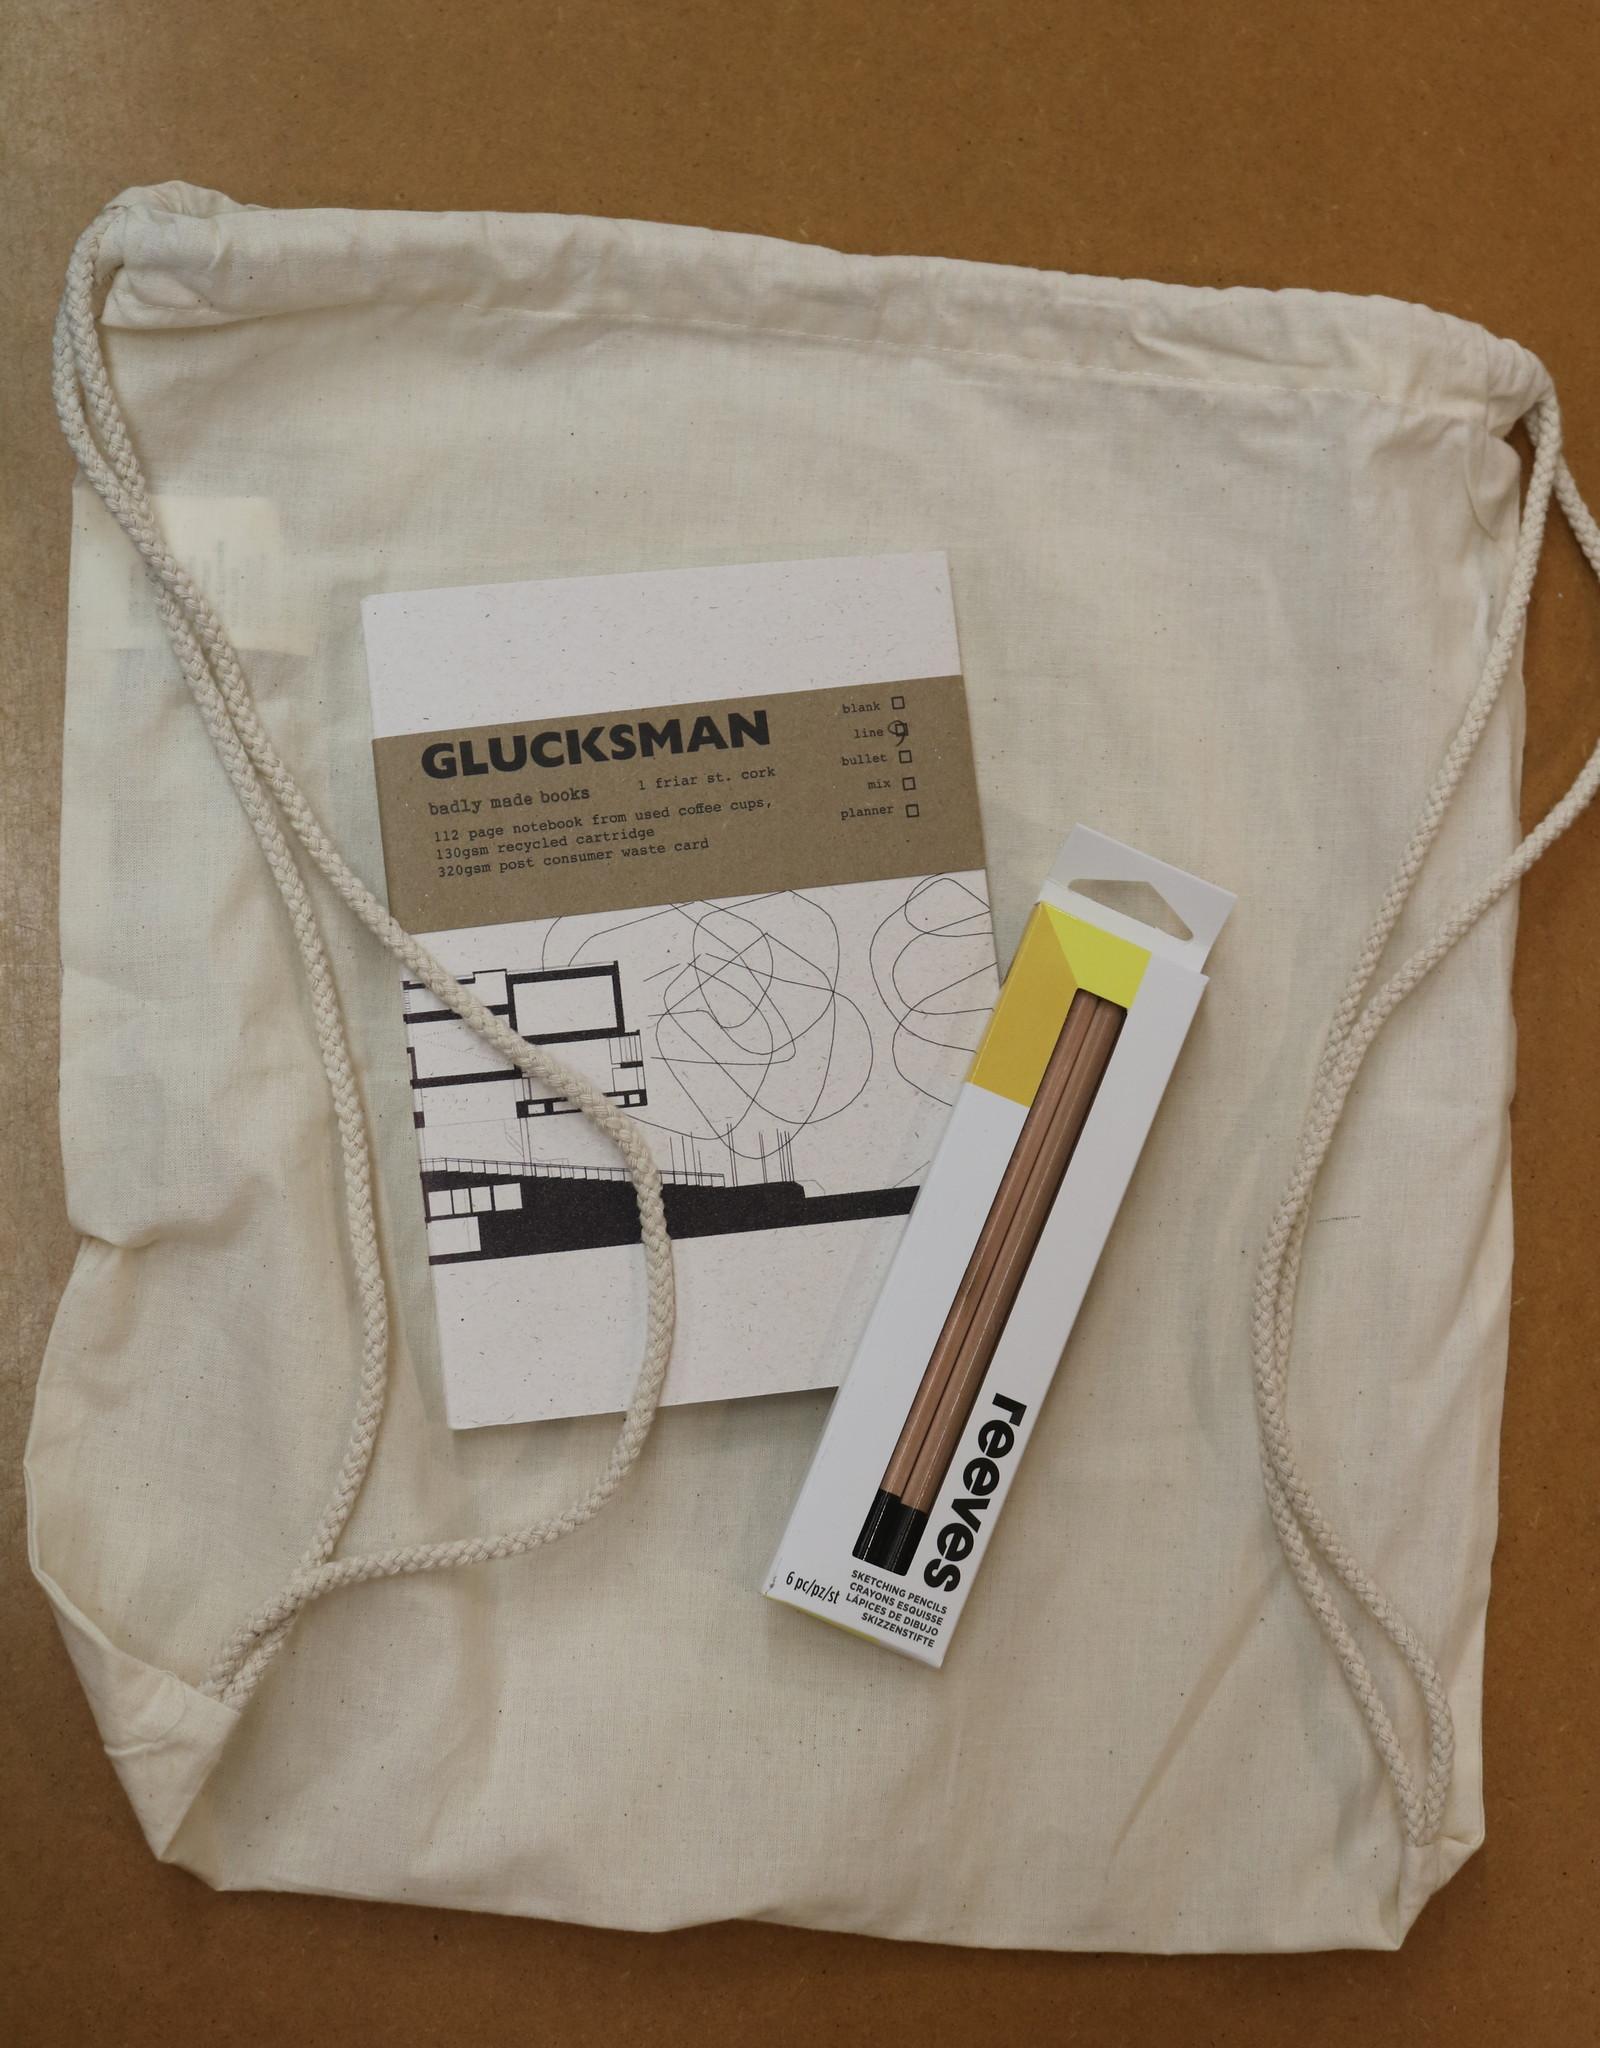 Creative Kit Glucksman